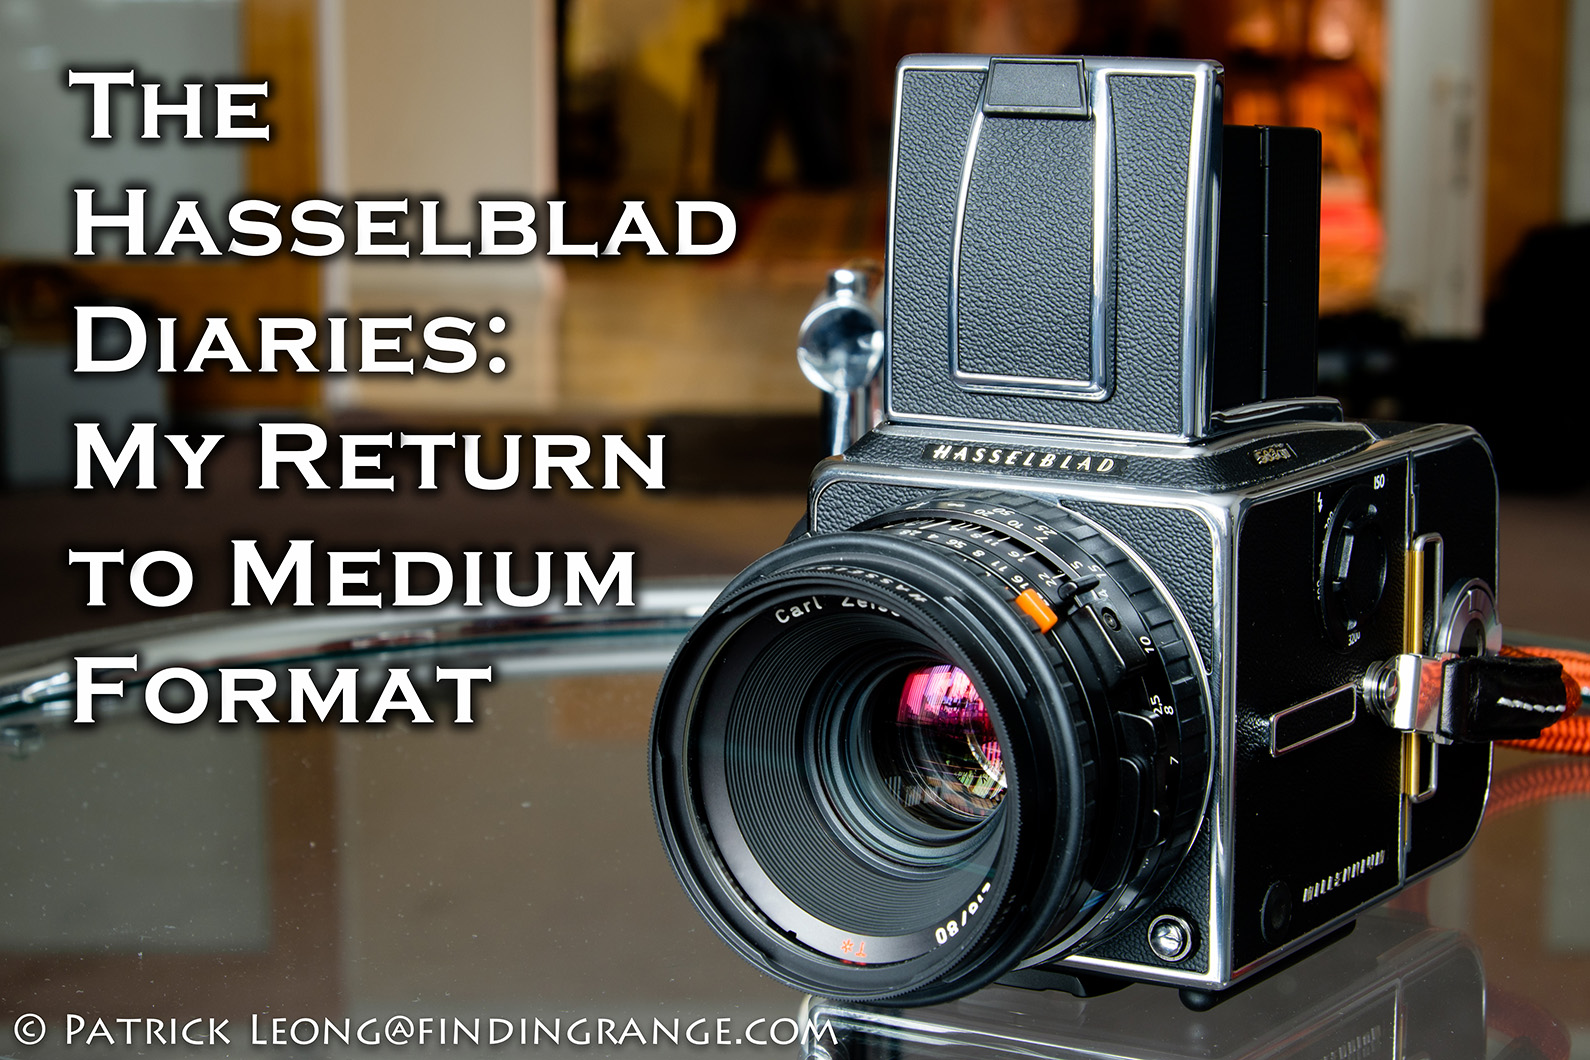 Hasselblad-503CW-Millennium-80mm-Planar-F2.8-CFE